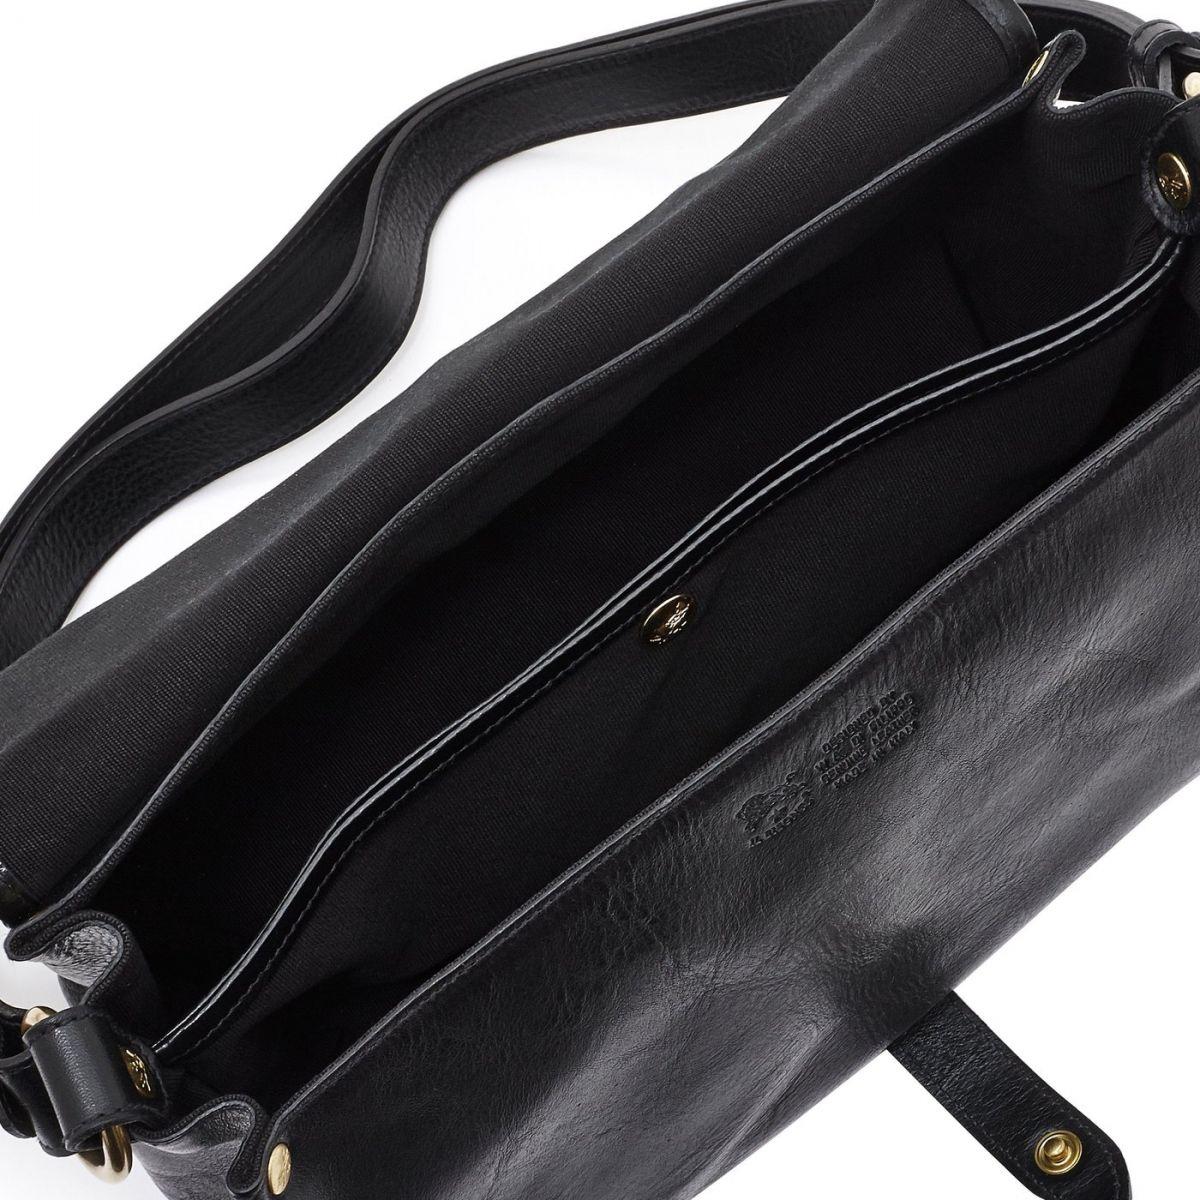 Women's Shoulder Bag in Cowhide Double Leather BSH034 color Black | Details